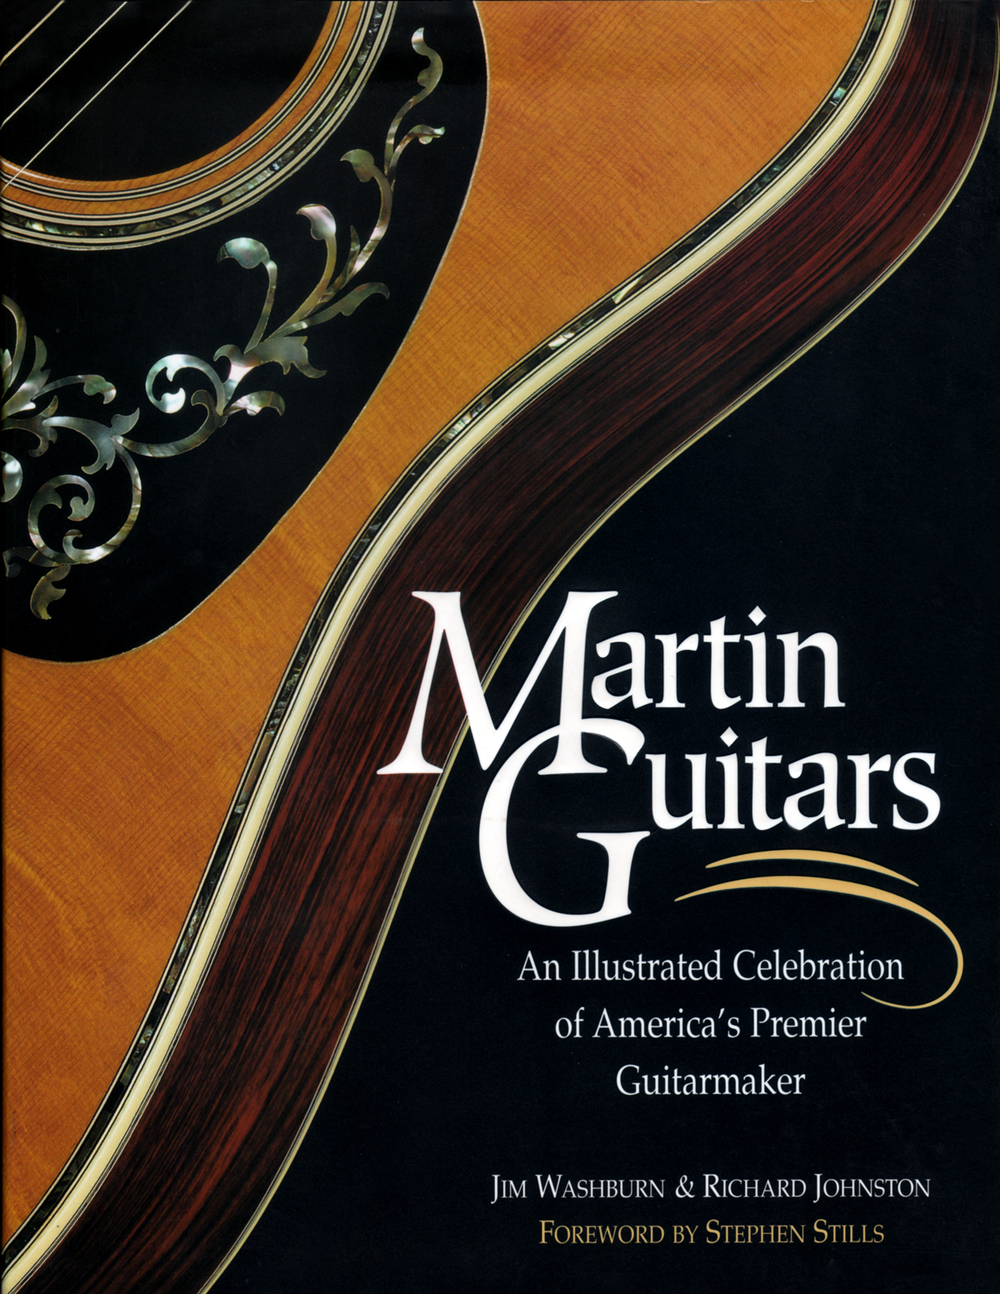 Martin Guitars: An Illustrated Celebration of America's Premier Guitar Maker